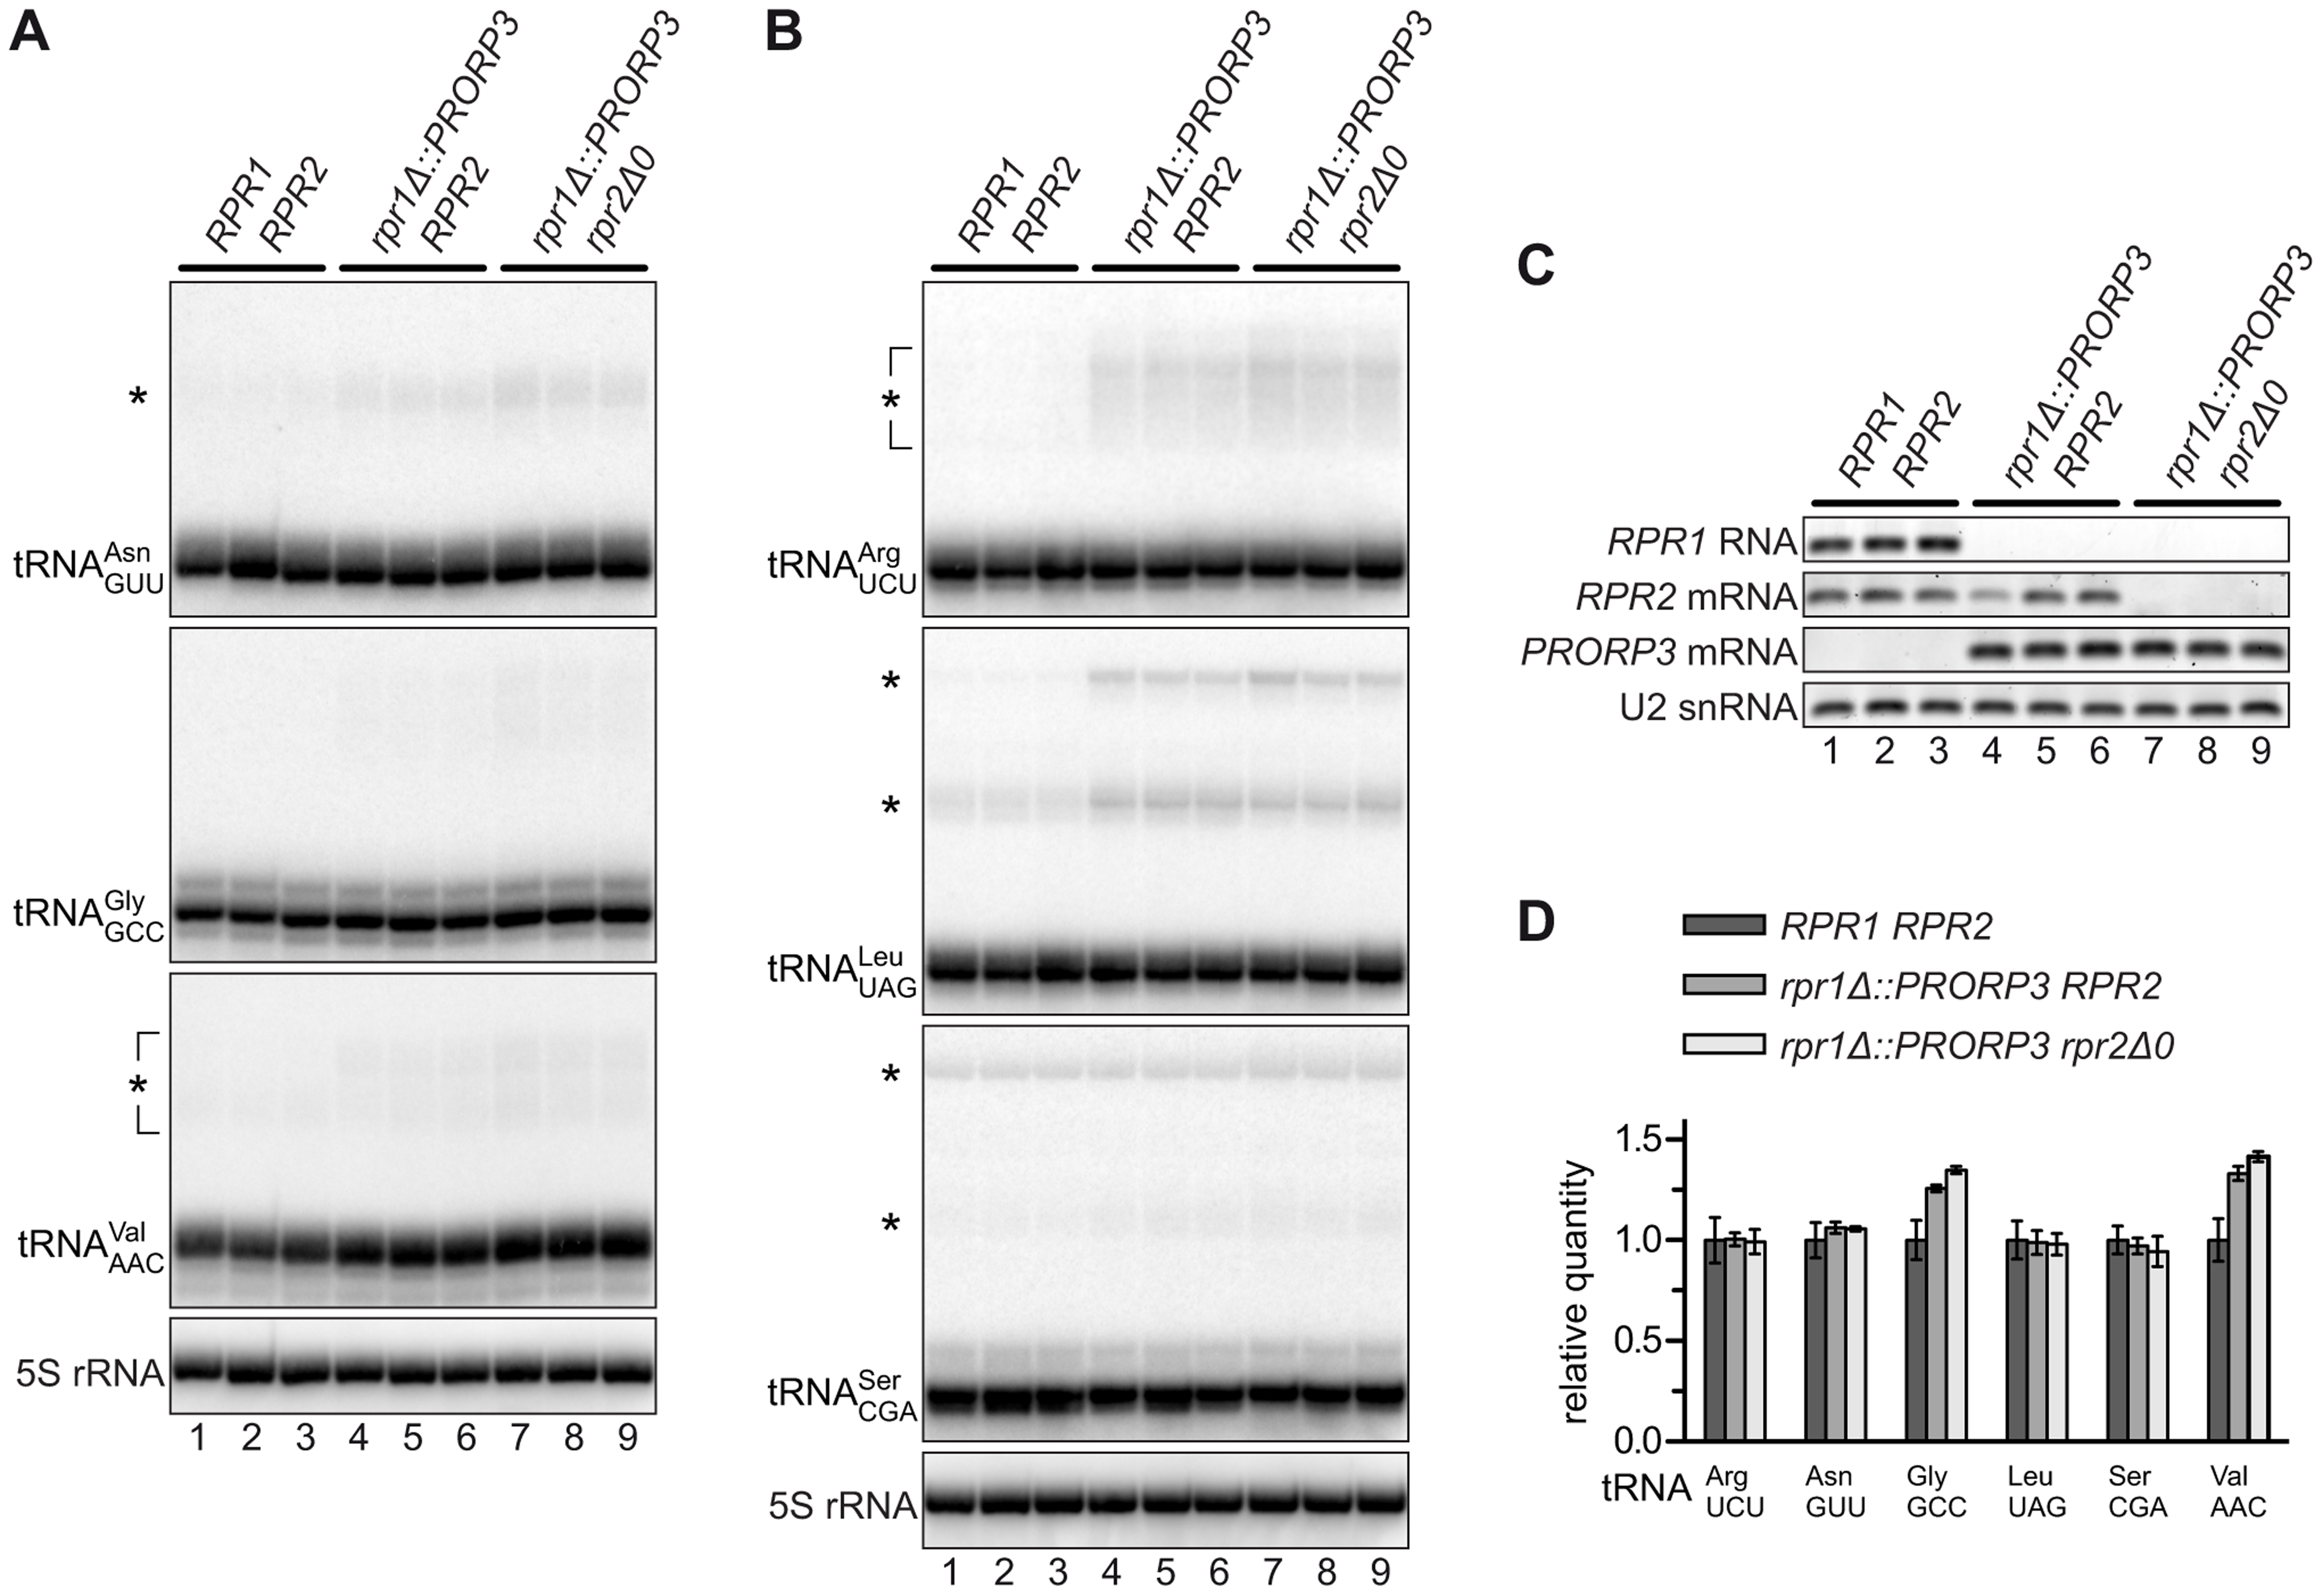 tRNAs in RNase P-swapped yeast strains.